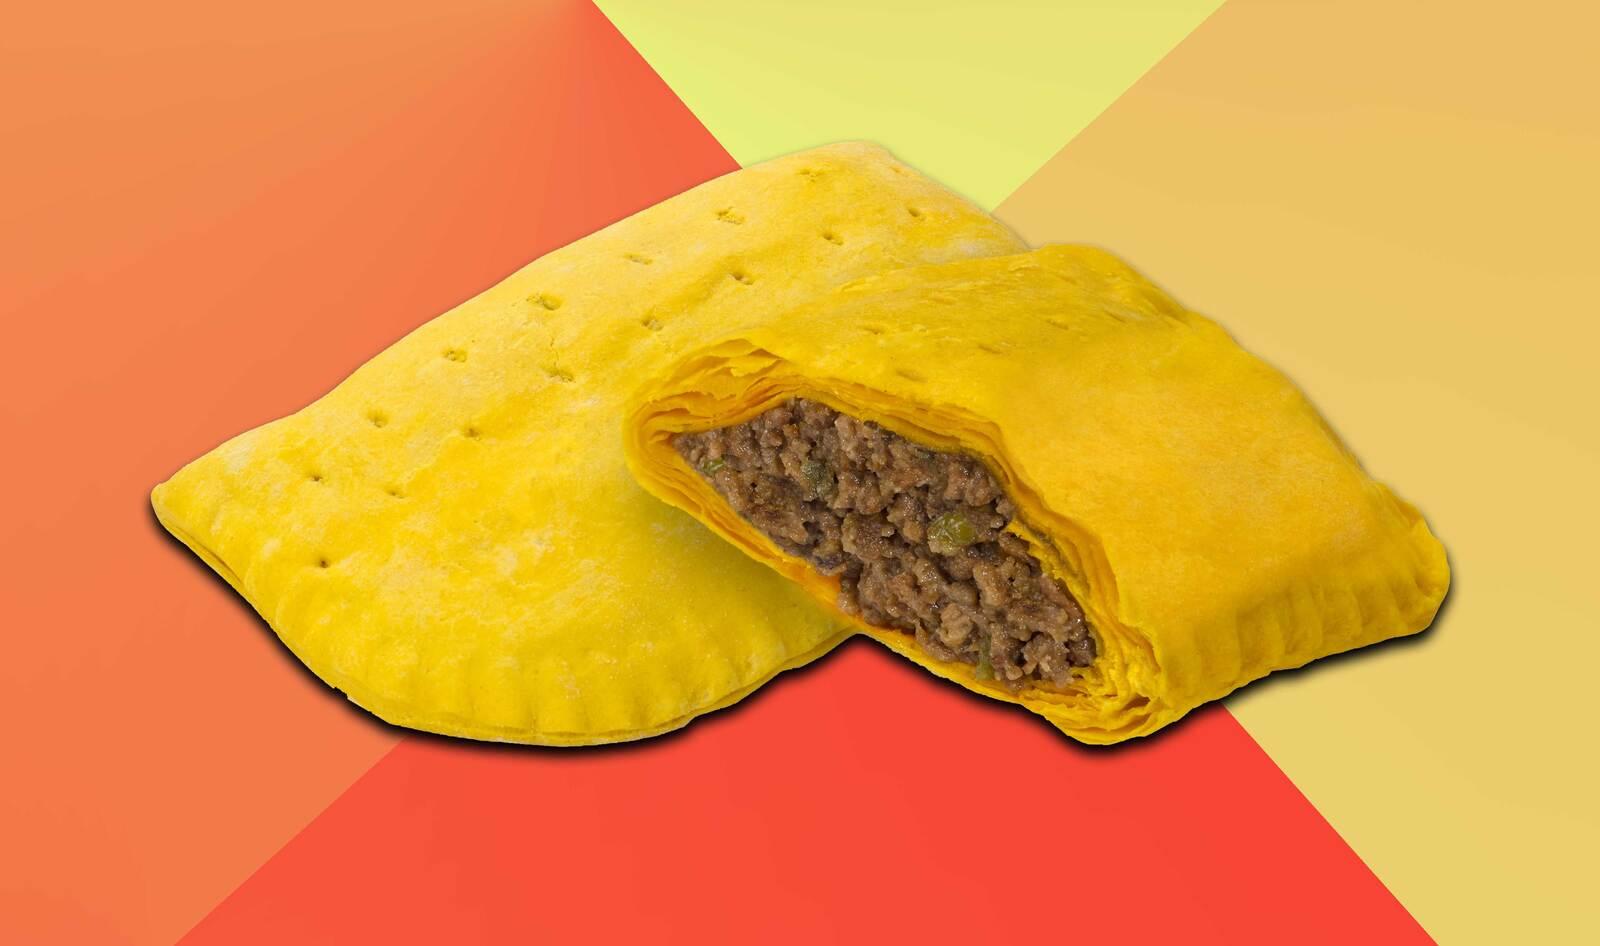 Nyc S Iconic Chain Golden Krust Debuts Vegan Beyond Beef Jamaican Patties Vegnews